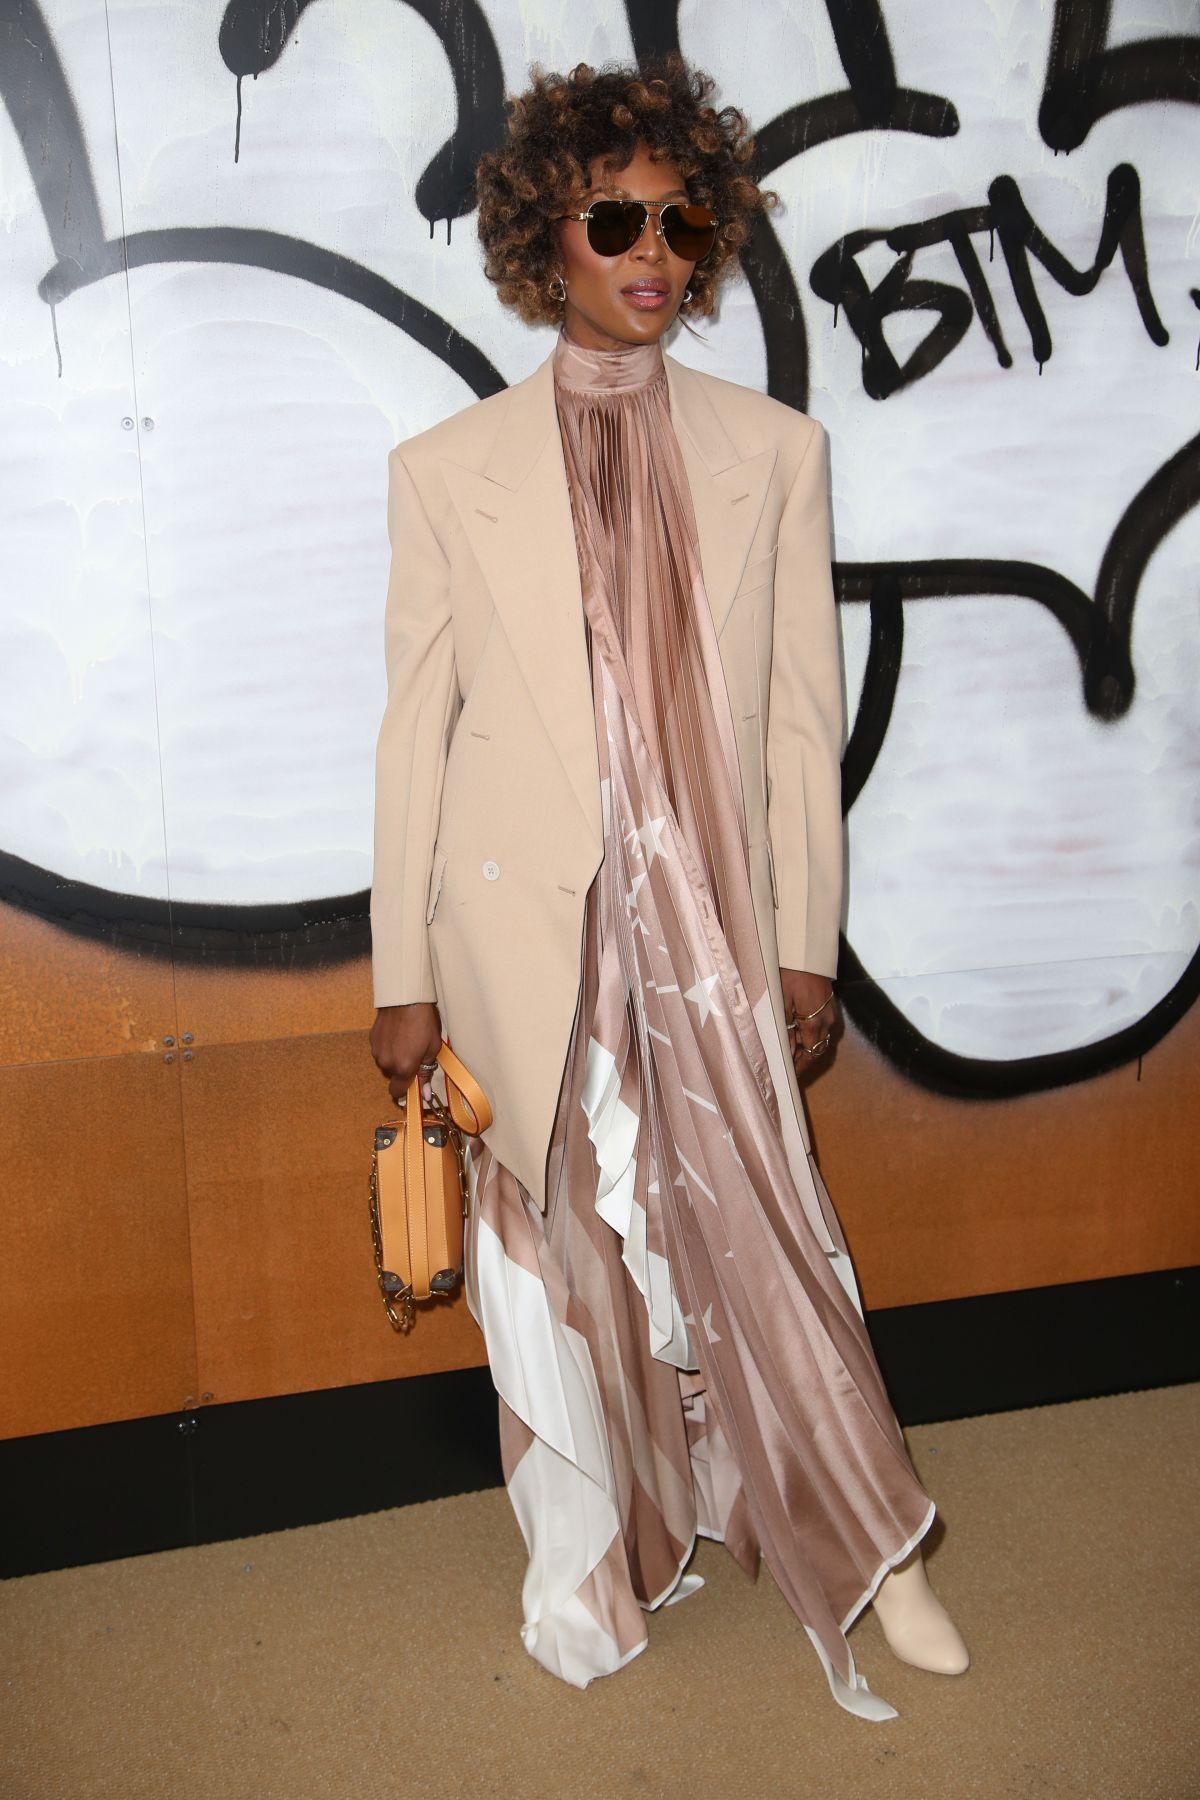 Naomi Campbell At Louis Vuitton Show At Paris Fashion Week 01 17